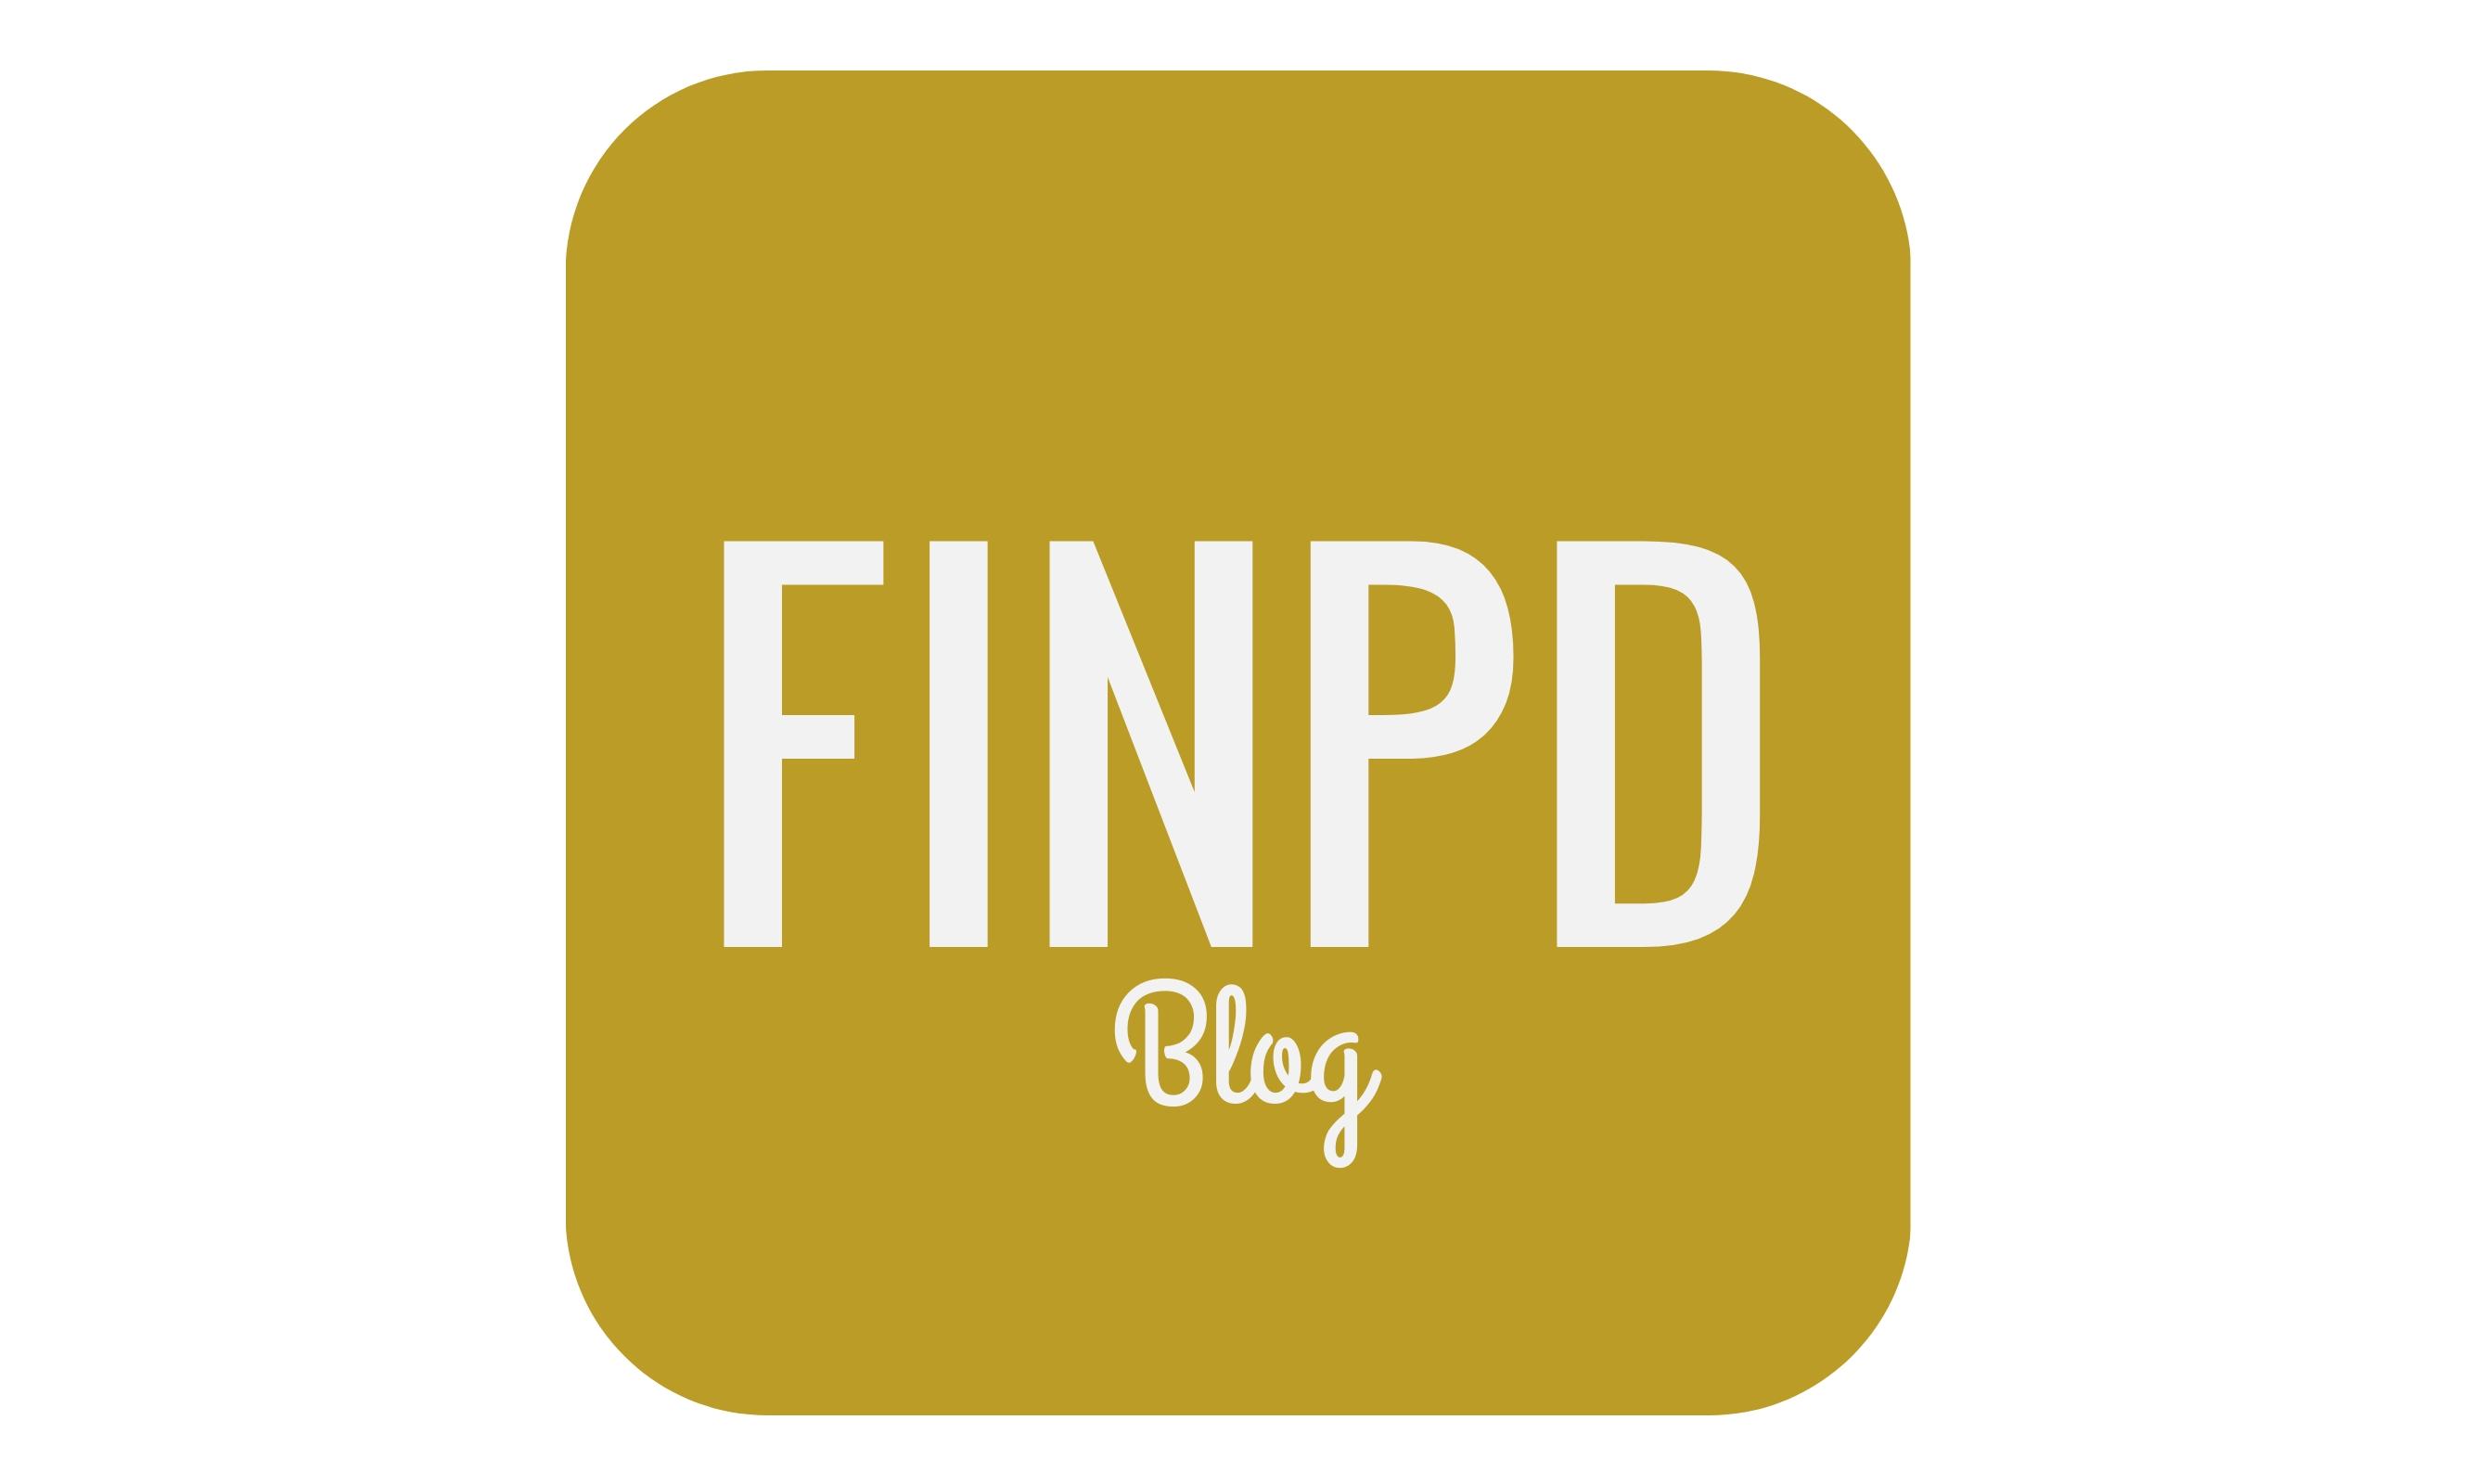 FINPD